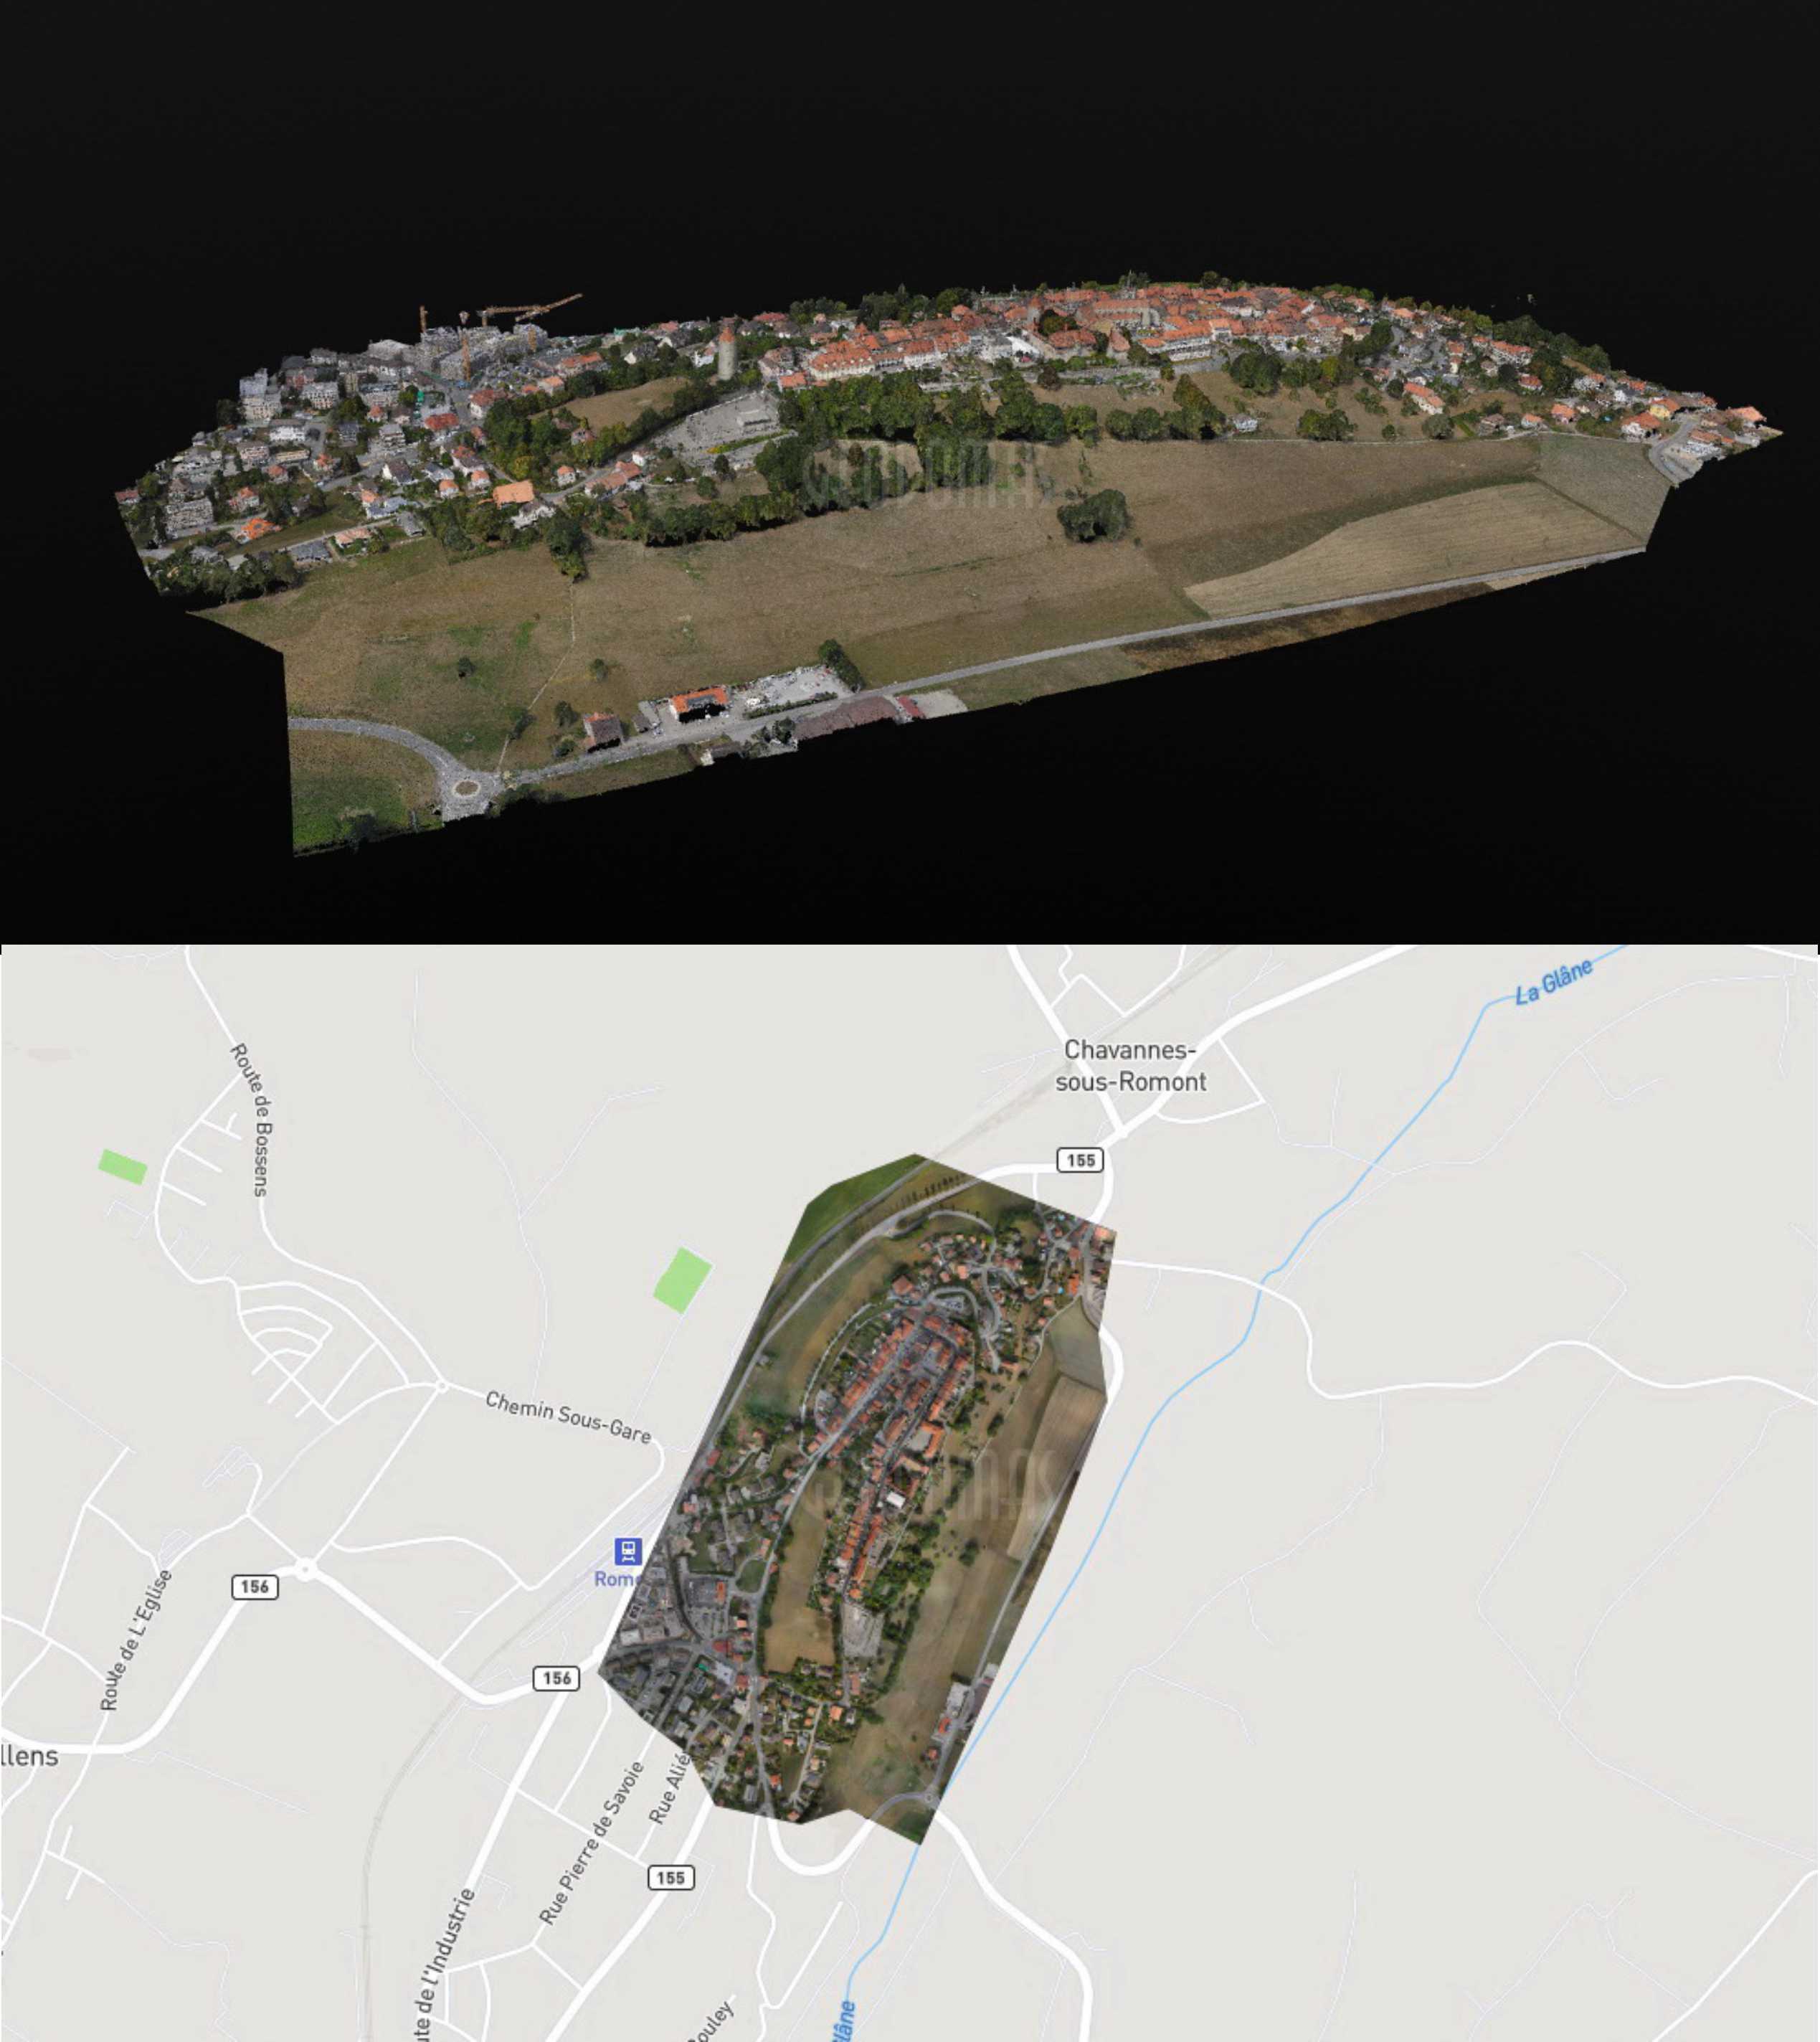 VR interactive 360°x180° Platform & 3D scanning